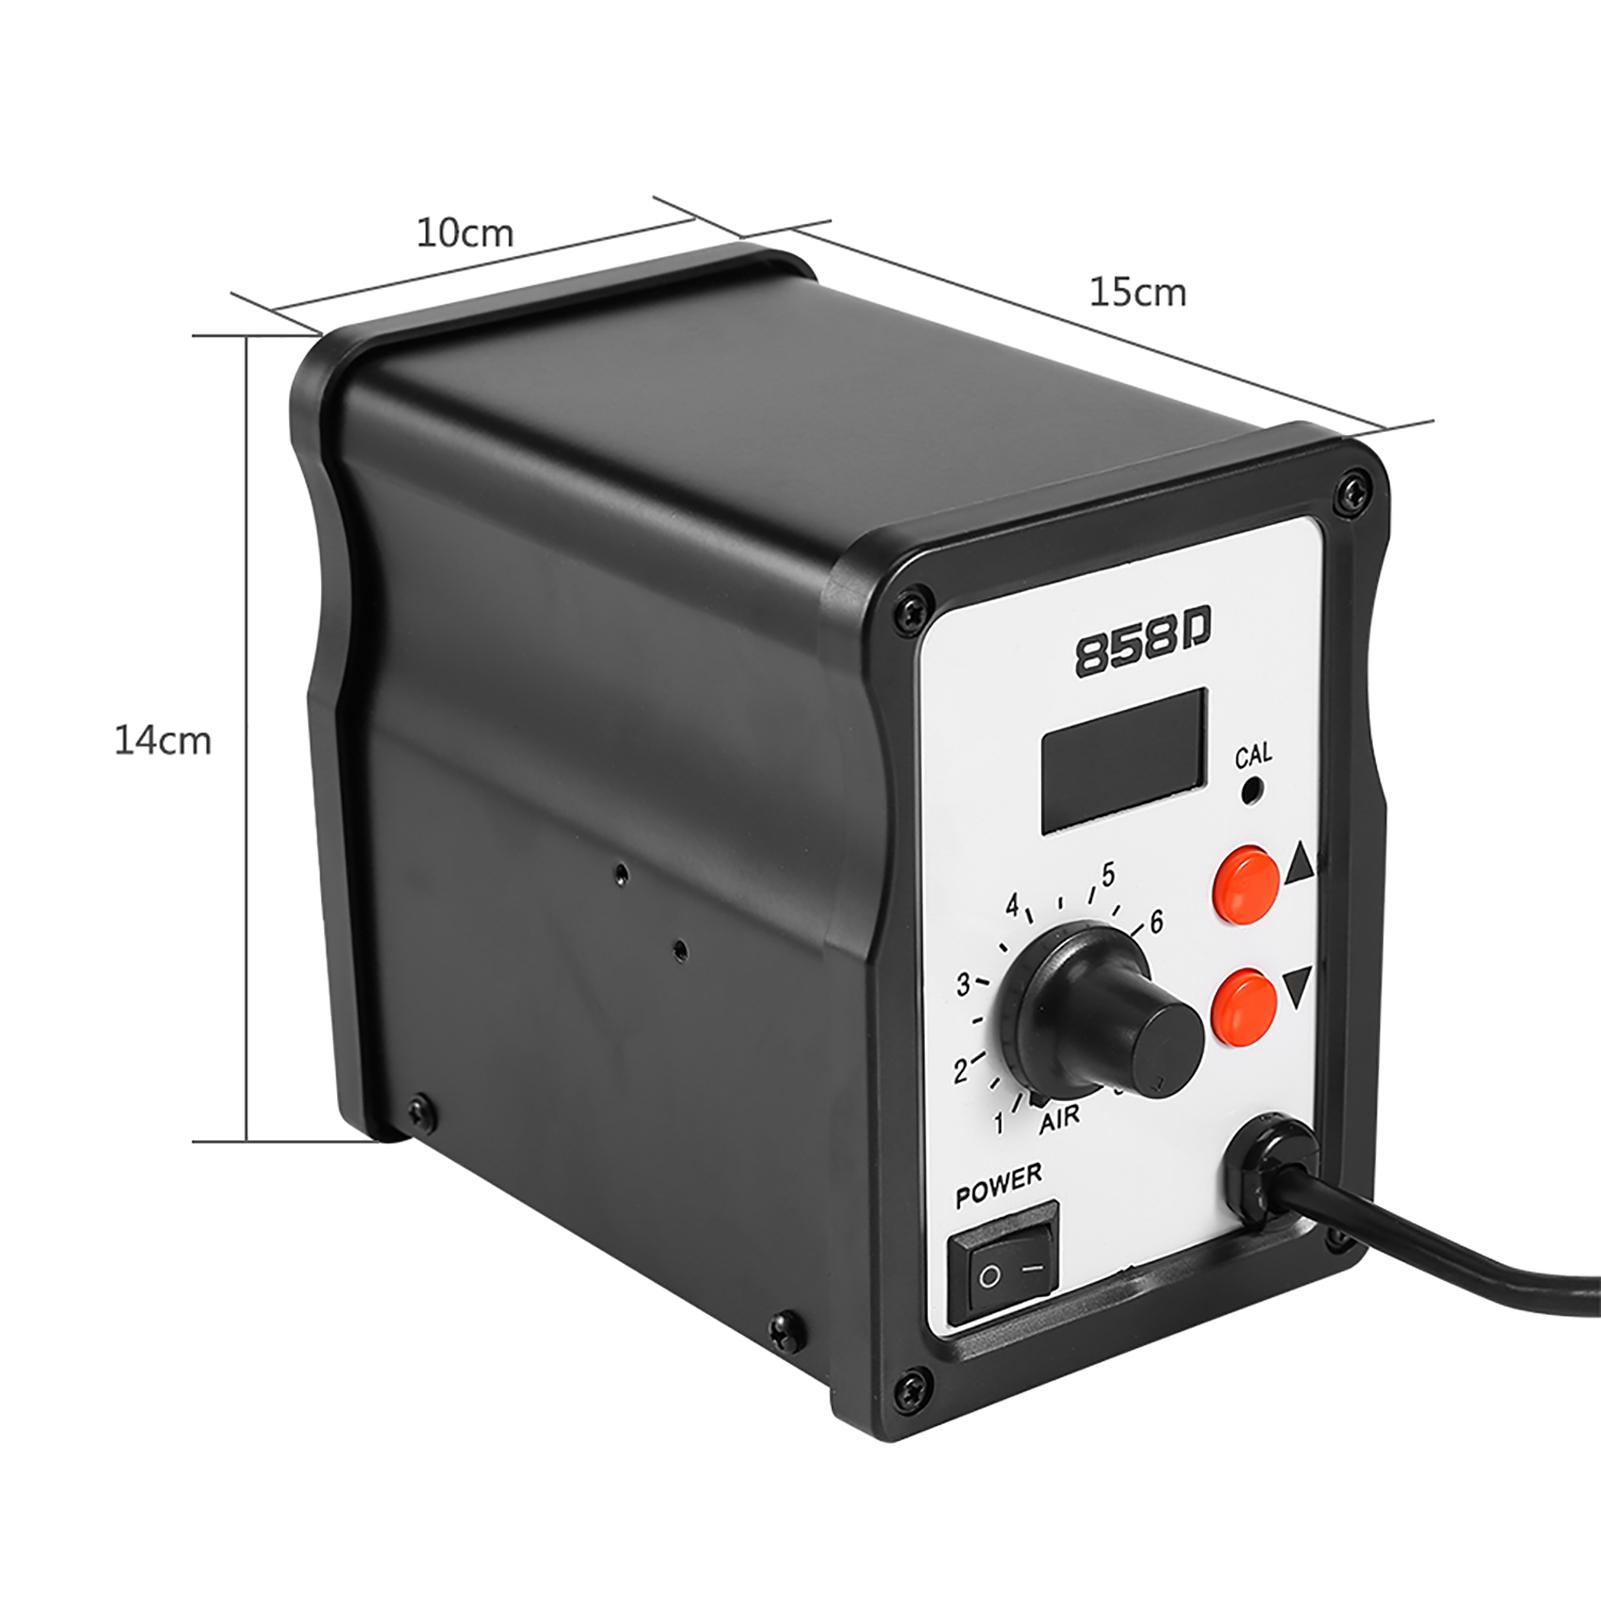 858D Rework Station Hot Air Gun Kit SMD Iron Soldering Solder Holder Tool USA